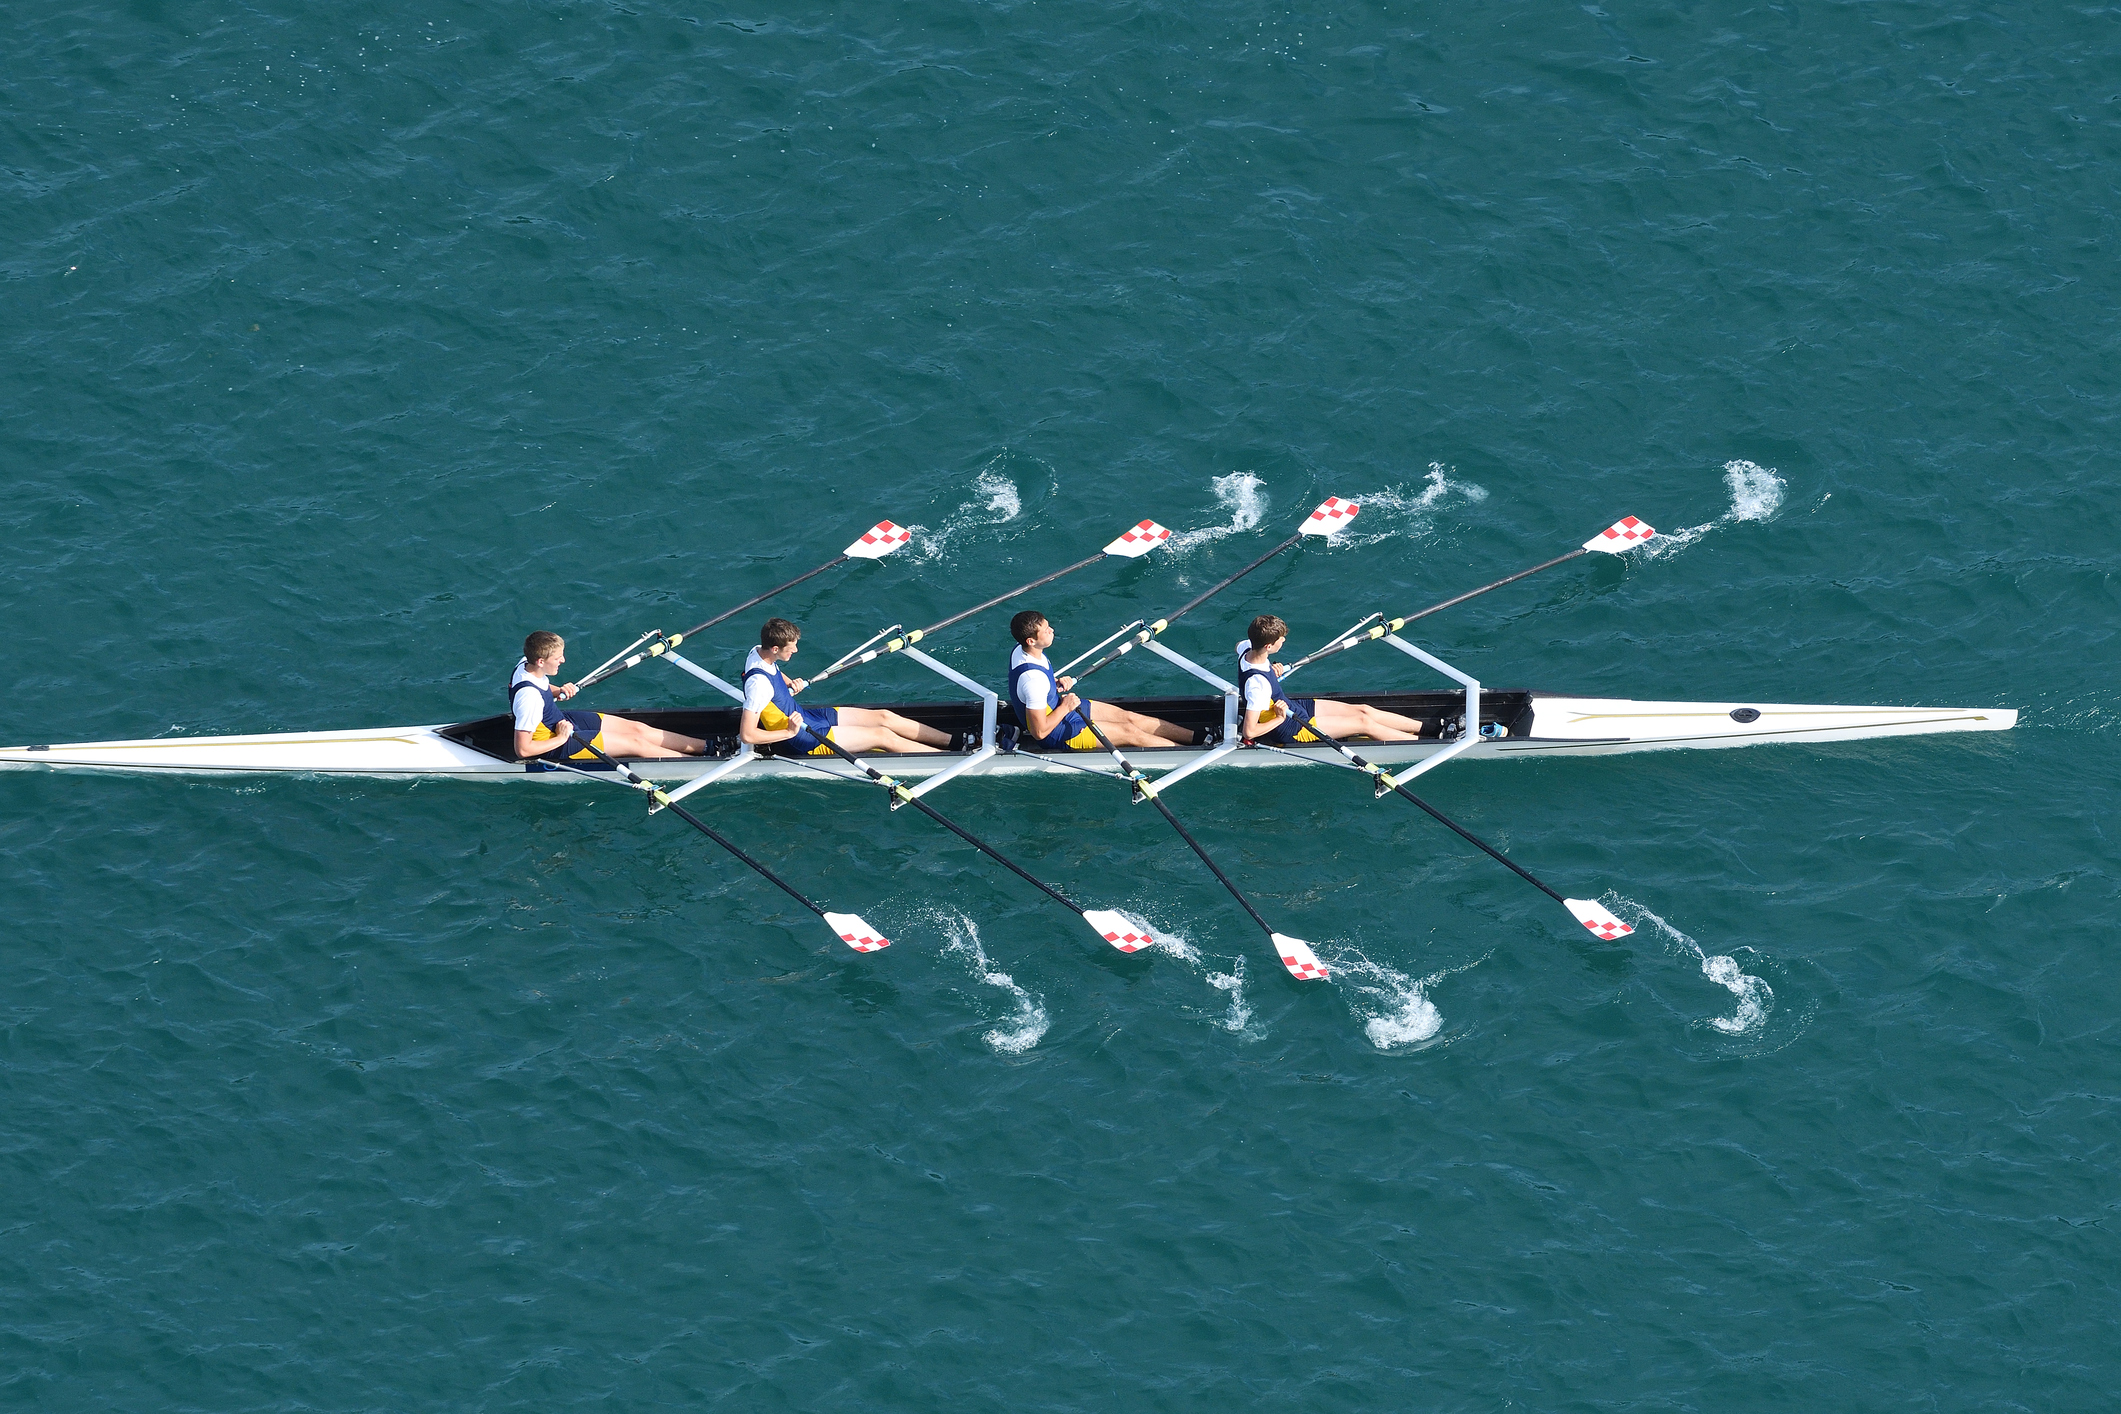 Rowing_iStock-881763502.jpg